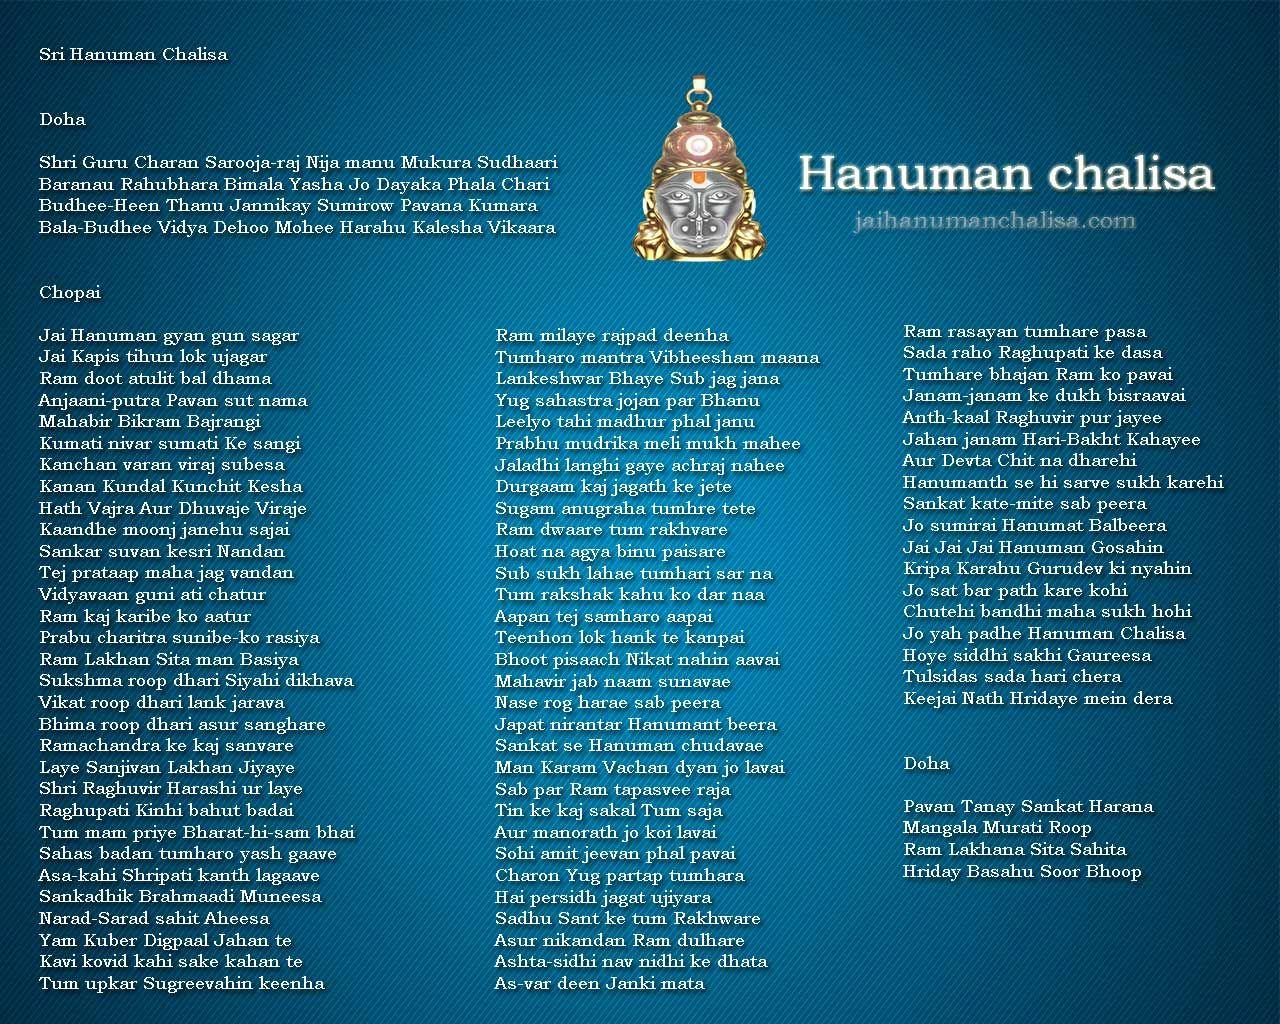 Shree hanuman chalisa full in english Hanuman chalisa